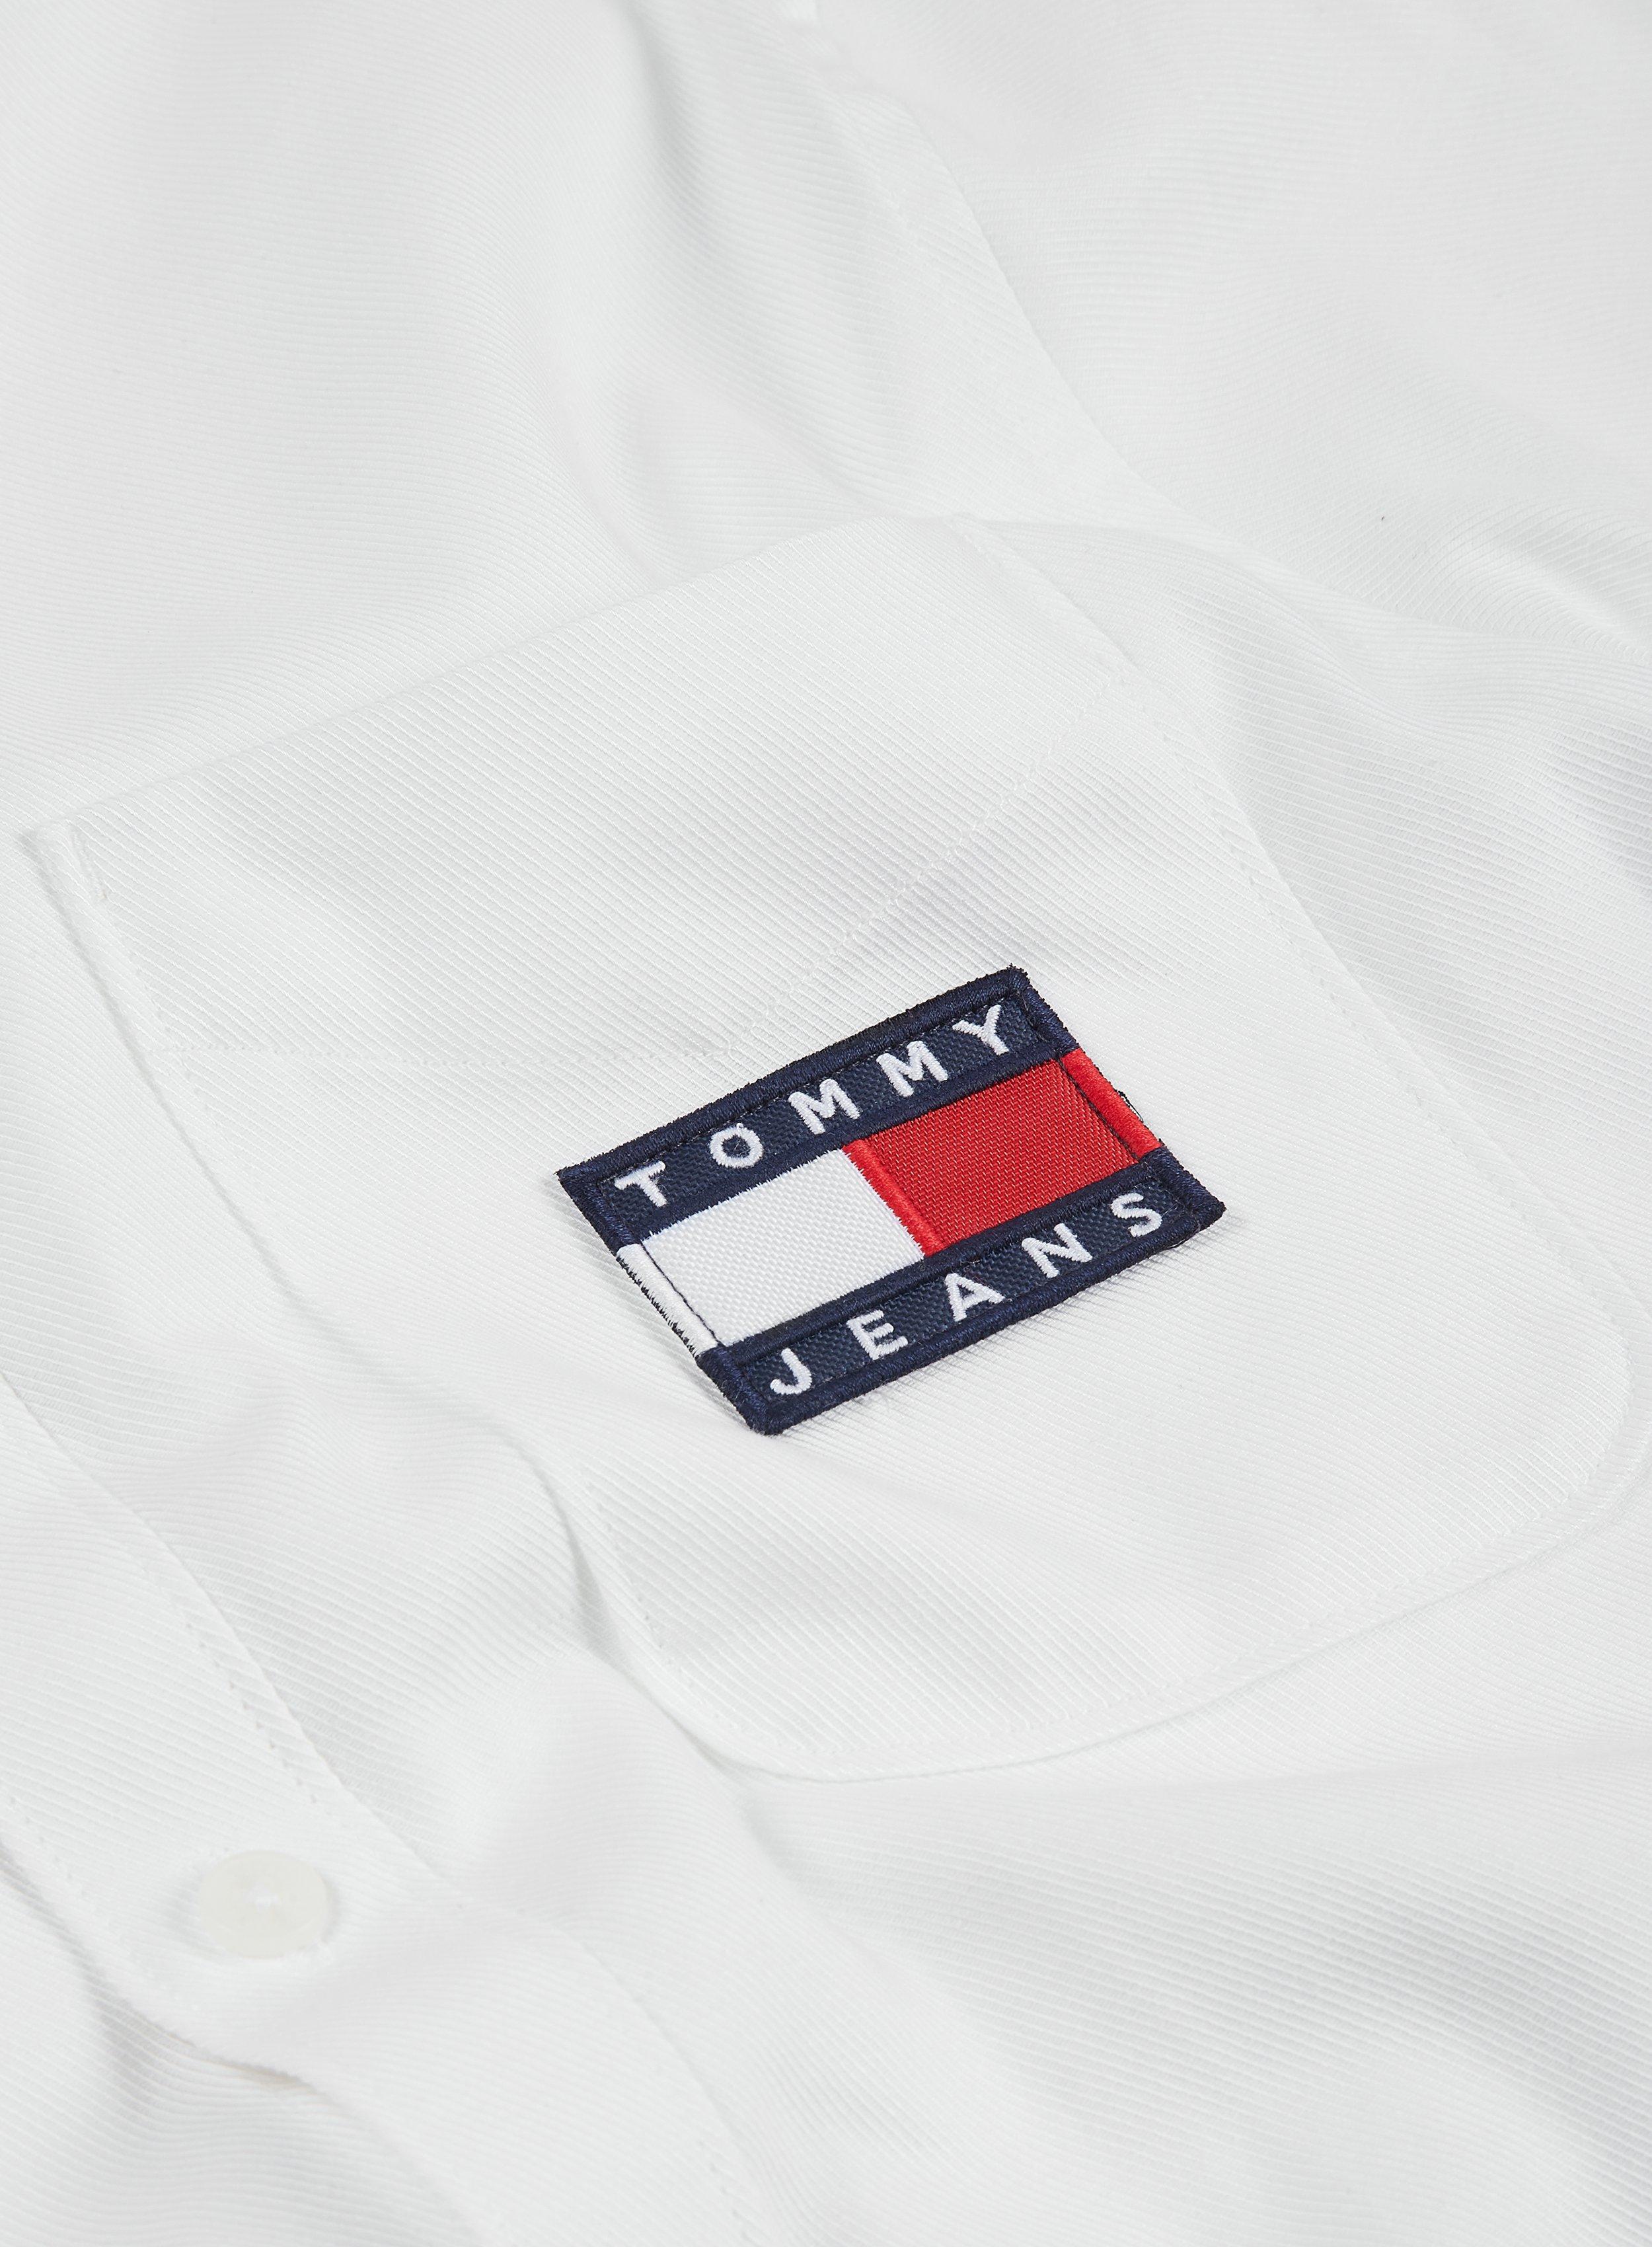 Large Uomo Bianco White Ya2 Tommy Hilfiger Tjm USA Mountain Logo Tee Maglietta a Maniche Lunghe